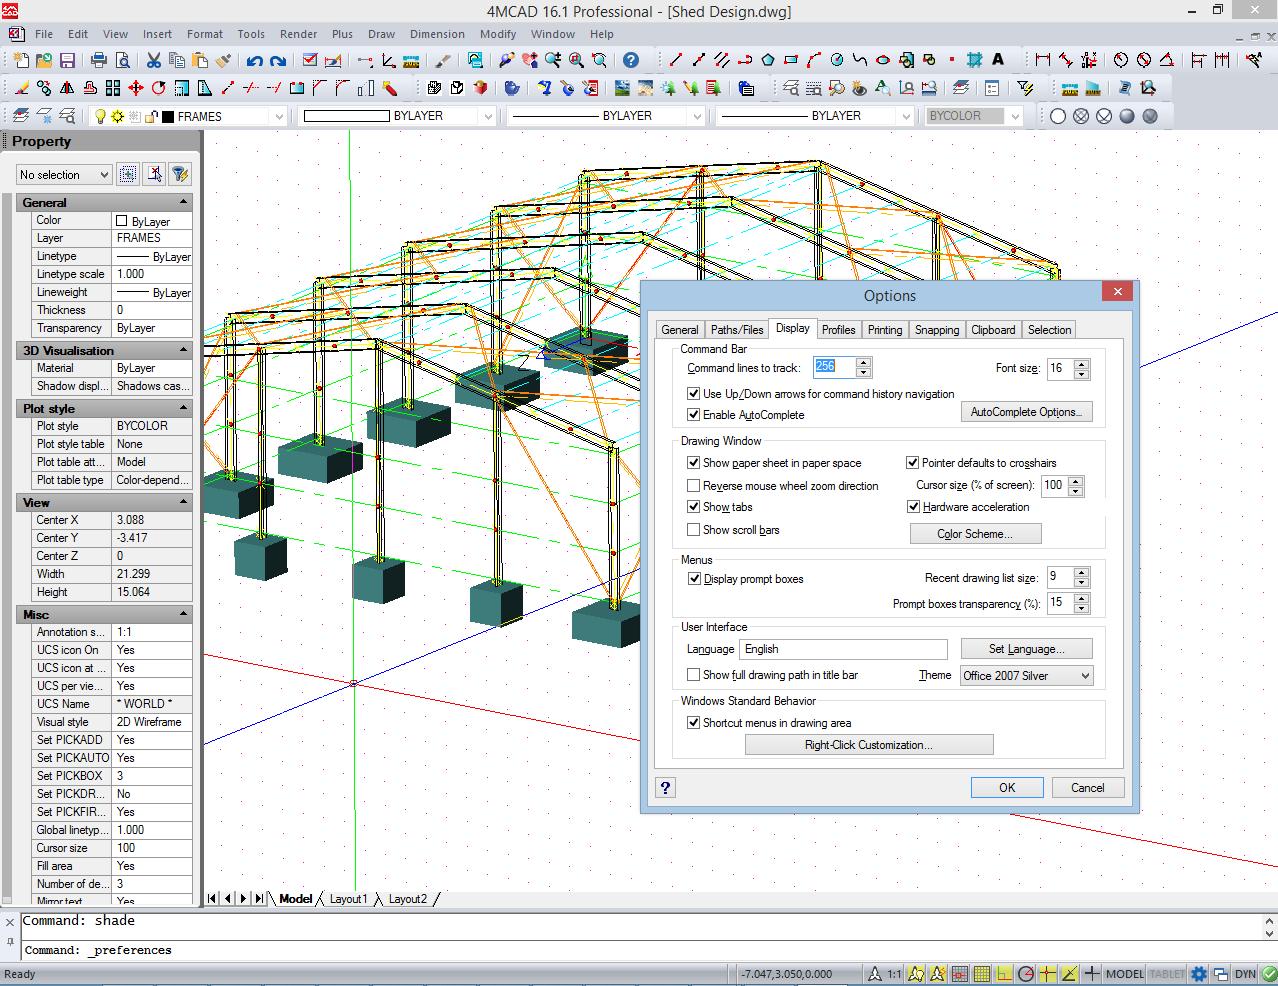 4m 4mcad Drawing Hvac Systems Using Autocad Mep 1 2 3 4 5 6